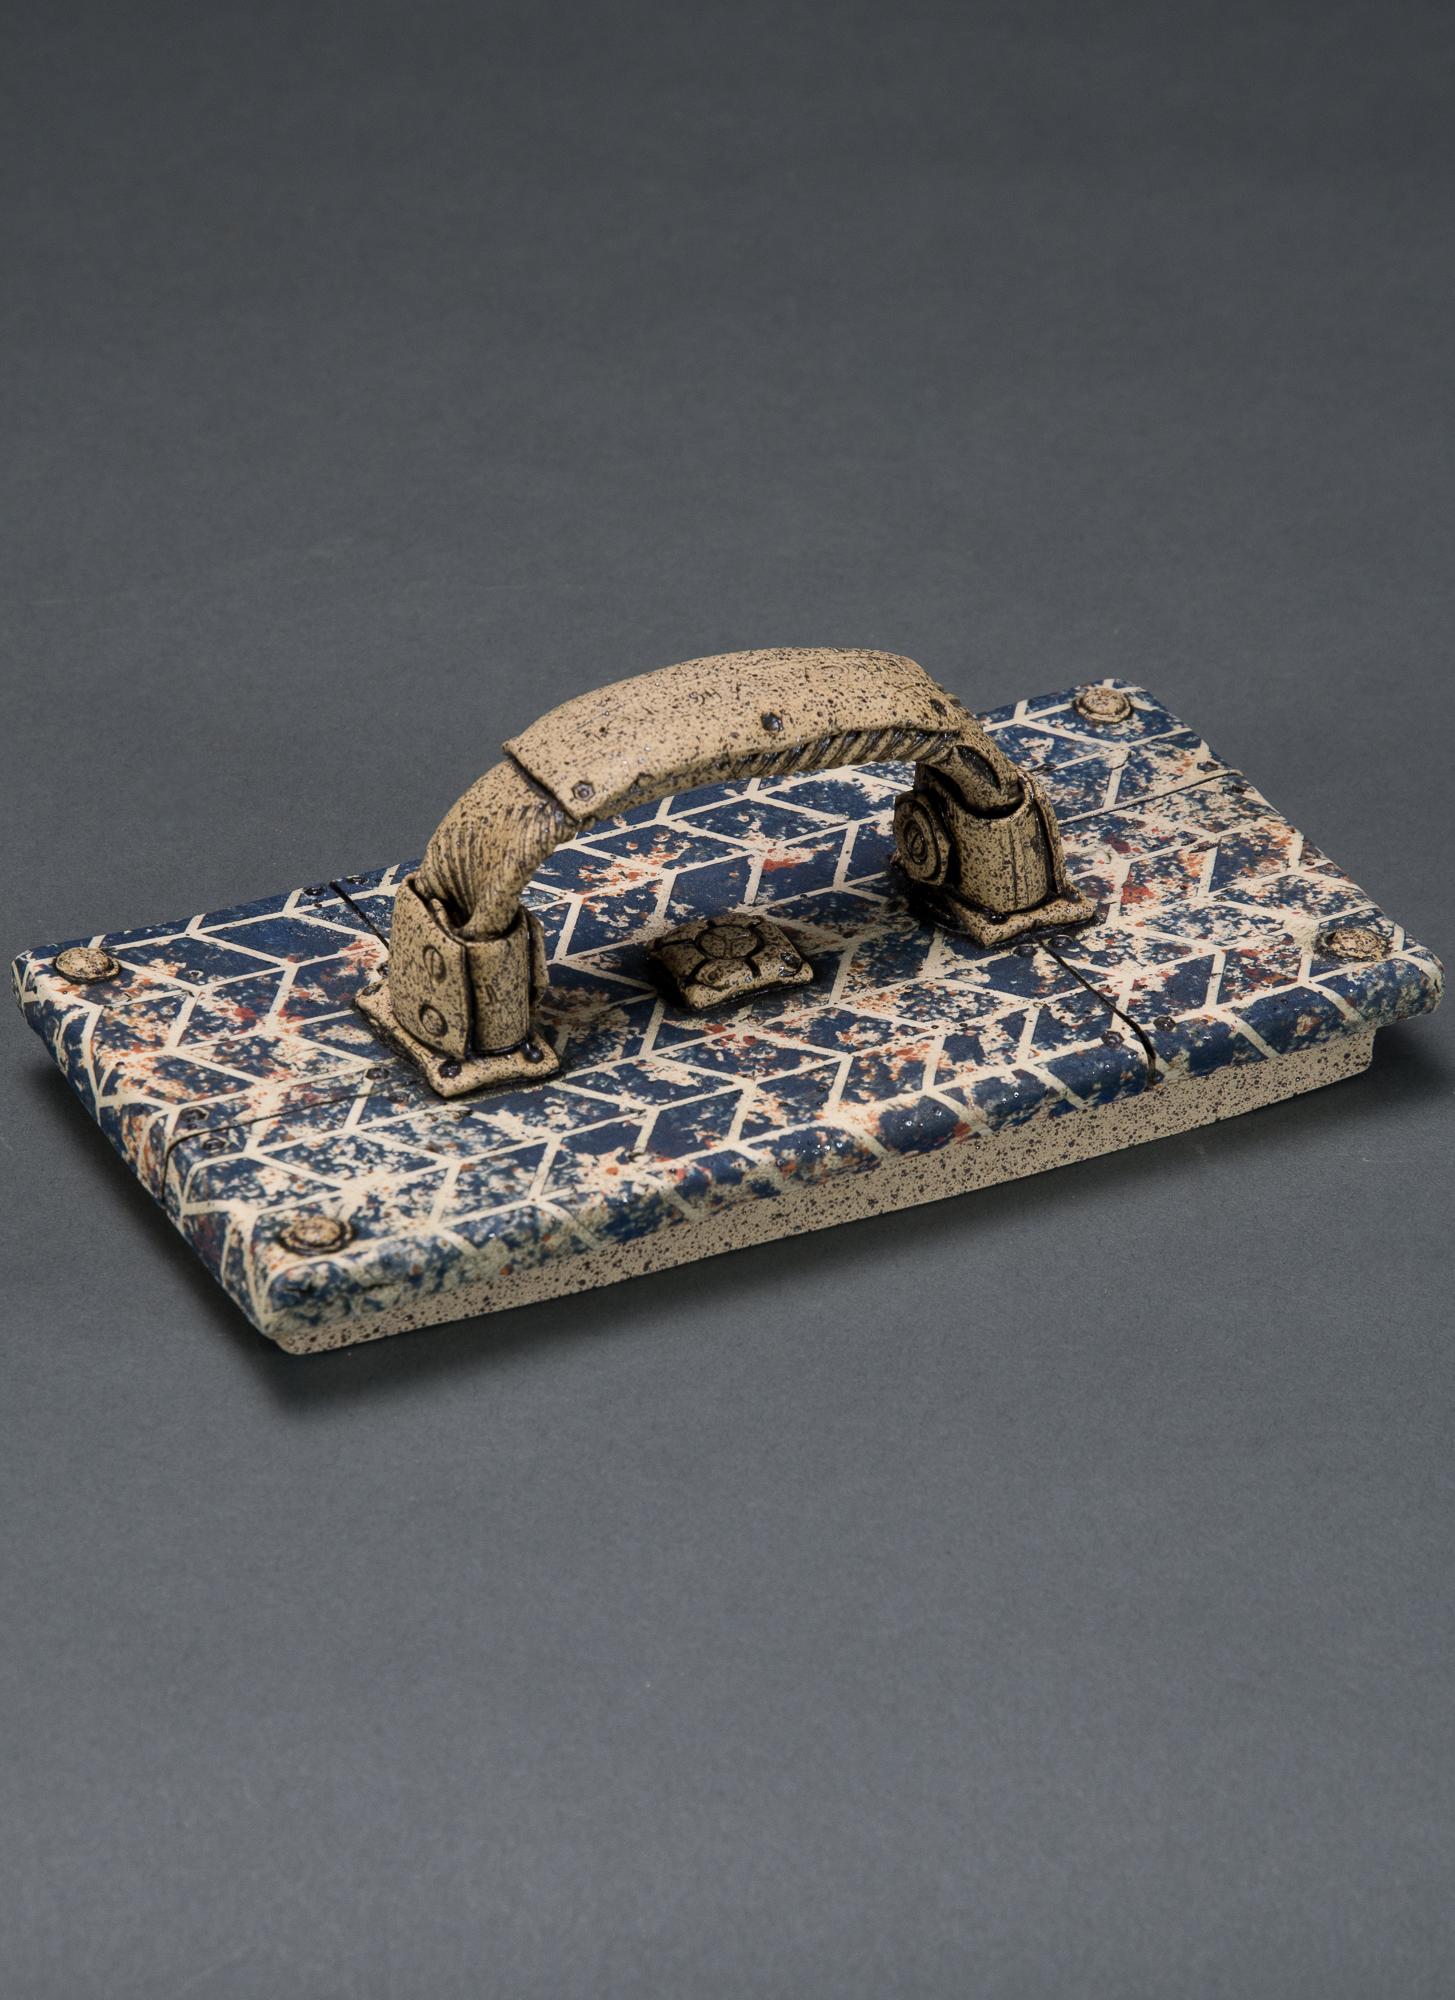 virginia pottery hand building ceramics clay steampunk animals underglaze transfer